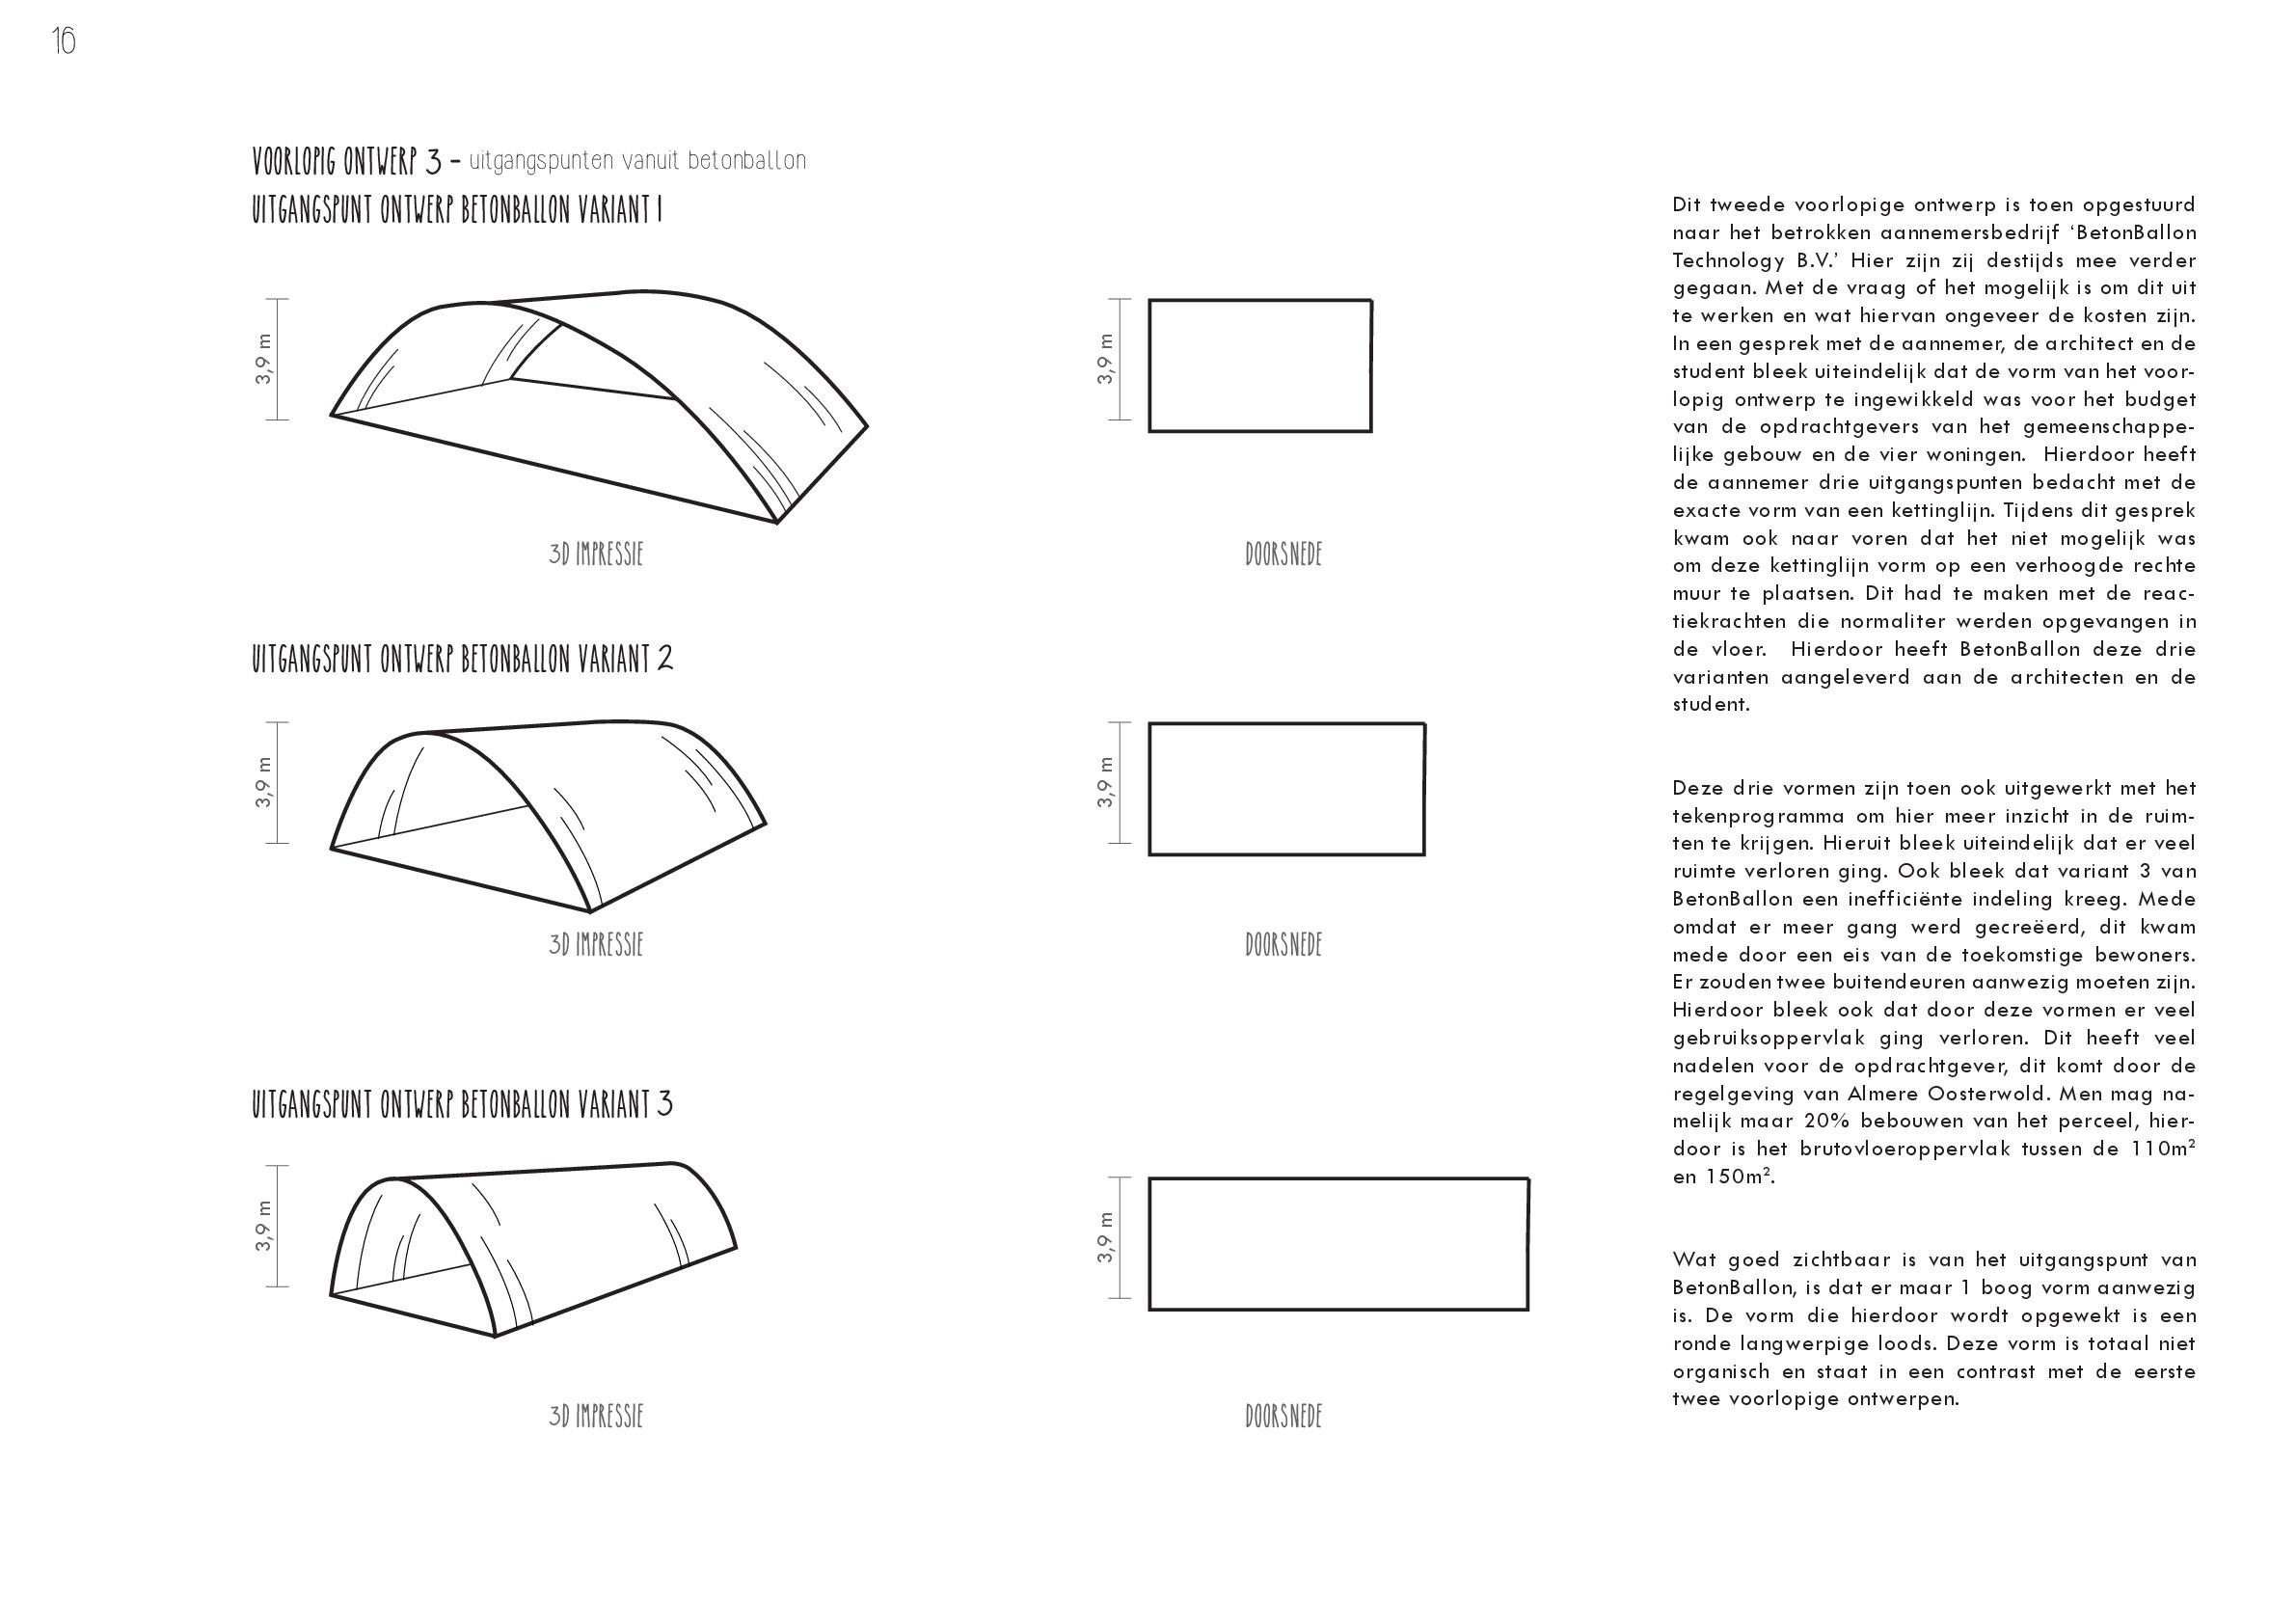 projectverslag-v2.8-inlever-016